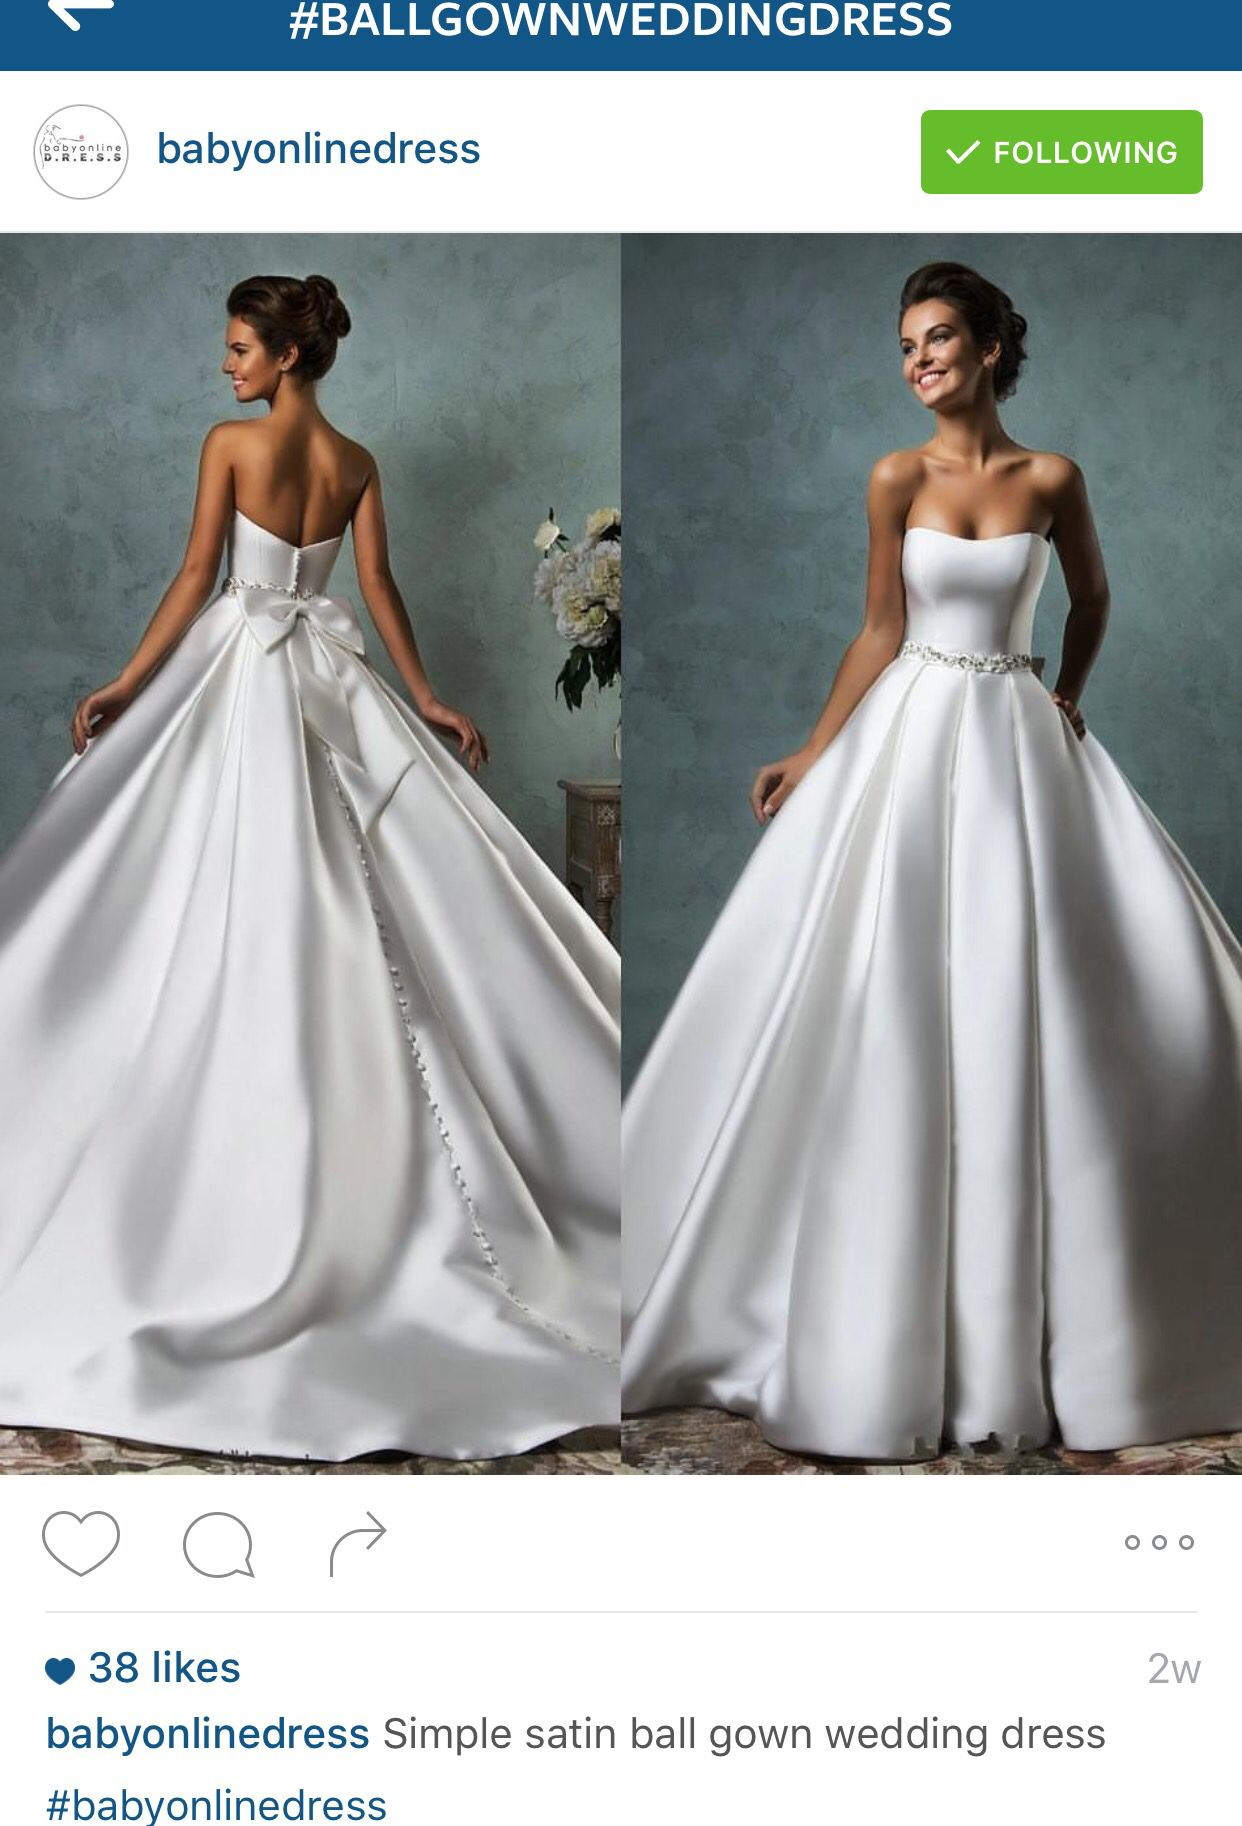 Satin Ballgown Wedding Dress Simple Wedding Dresses Satin Wedding Dresses Satin Wedding Dress Ballgown [ 1826 x 1242 Pixel ]